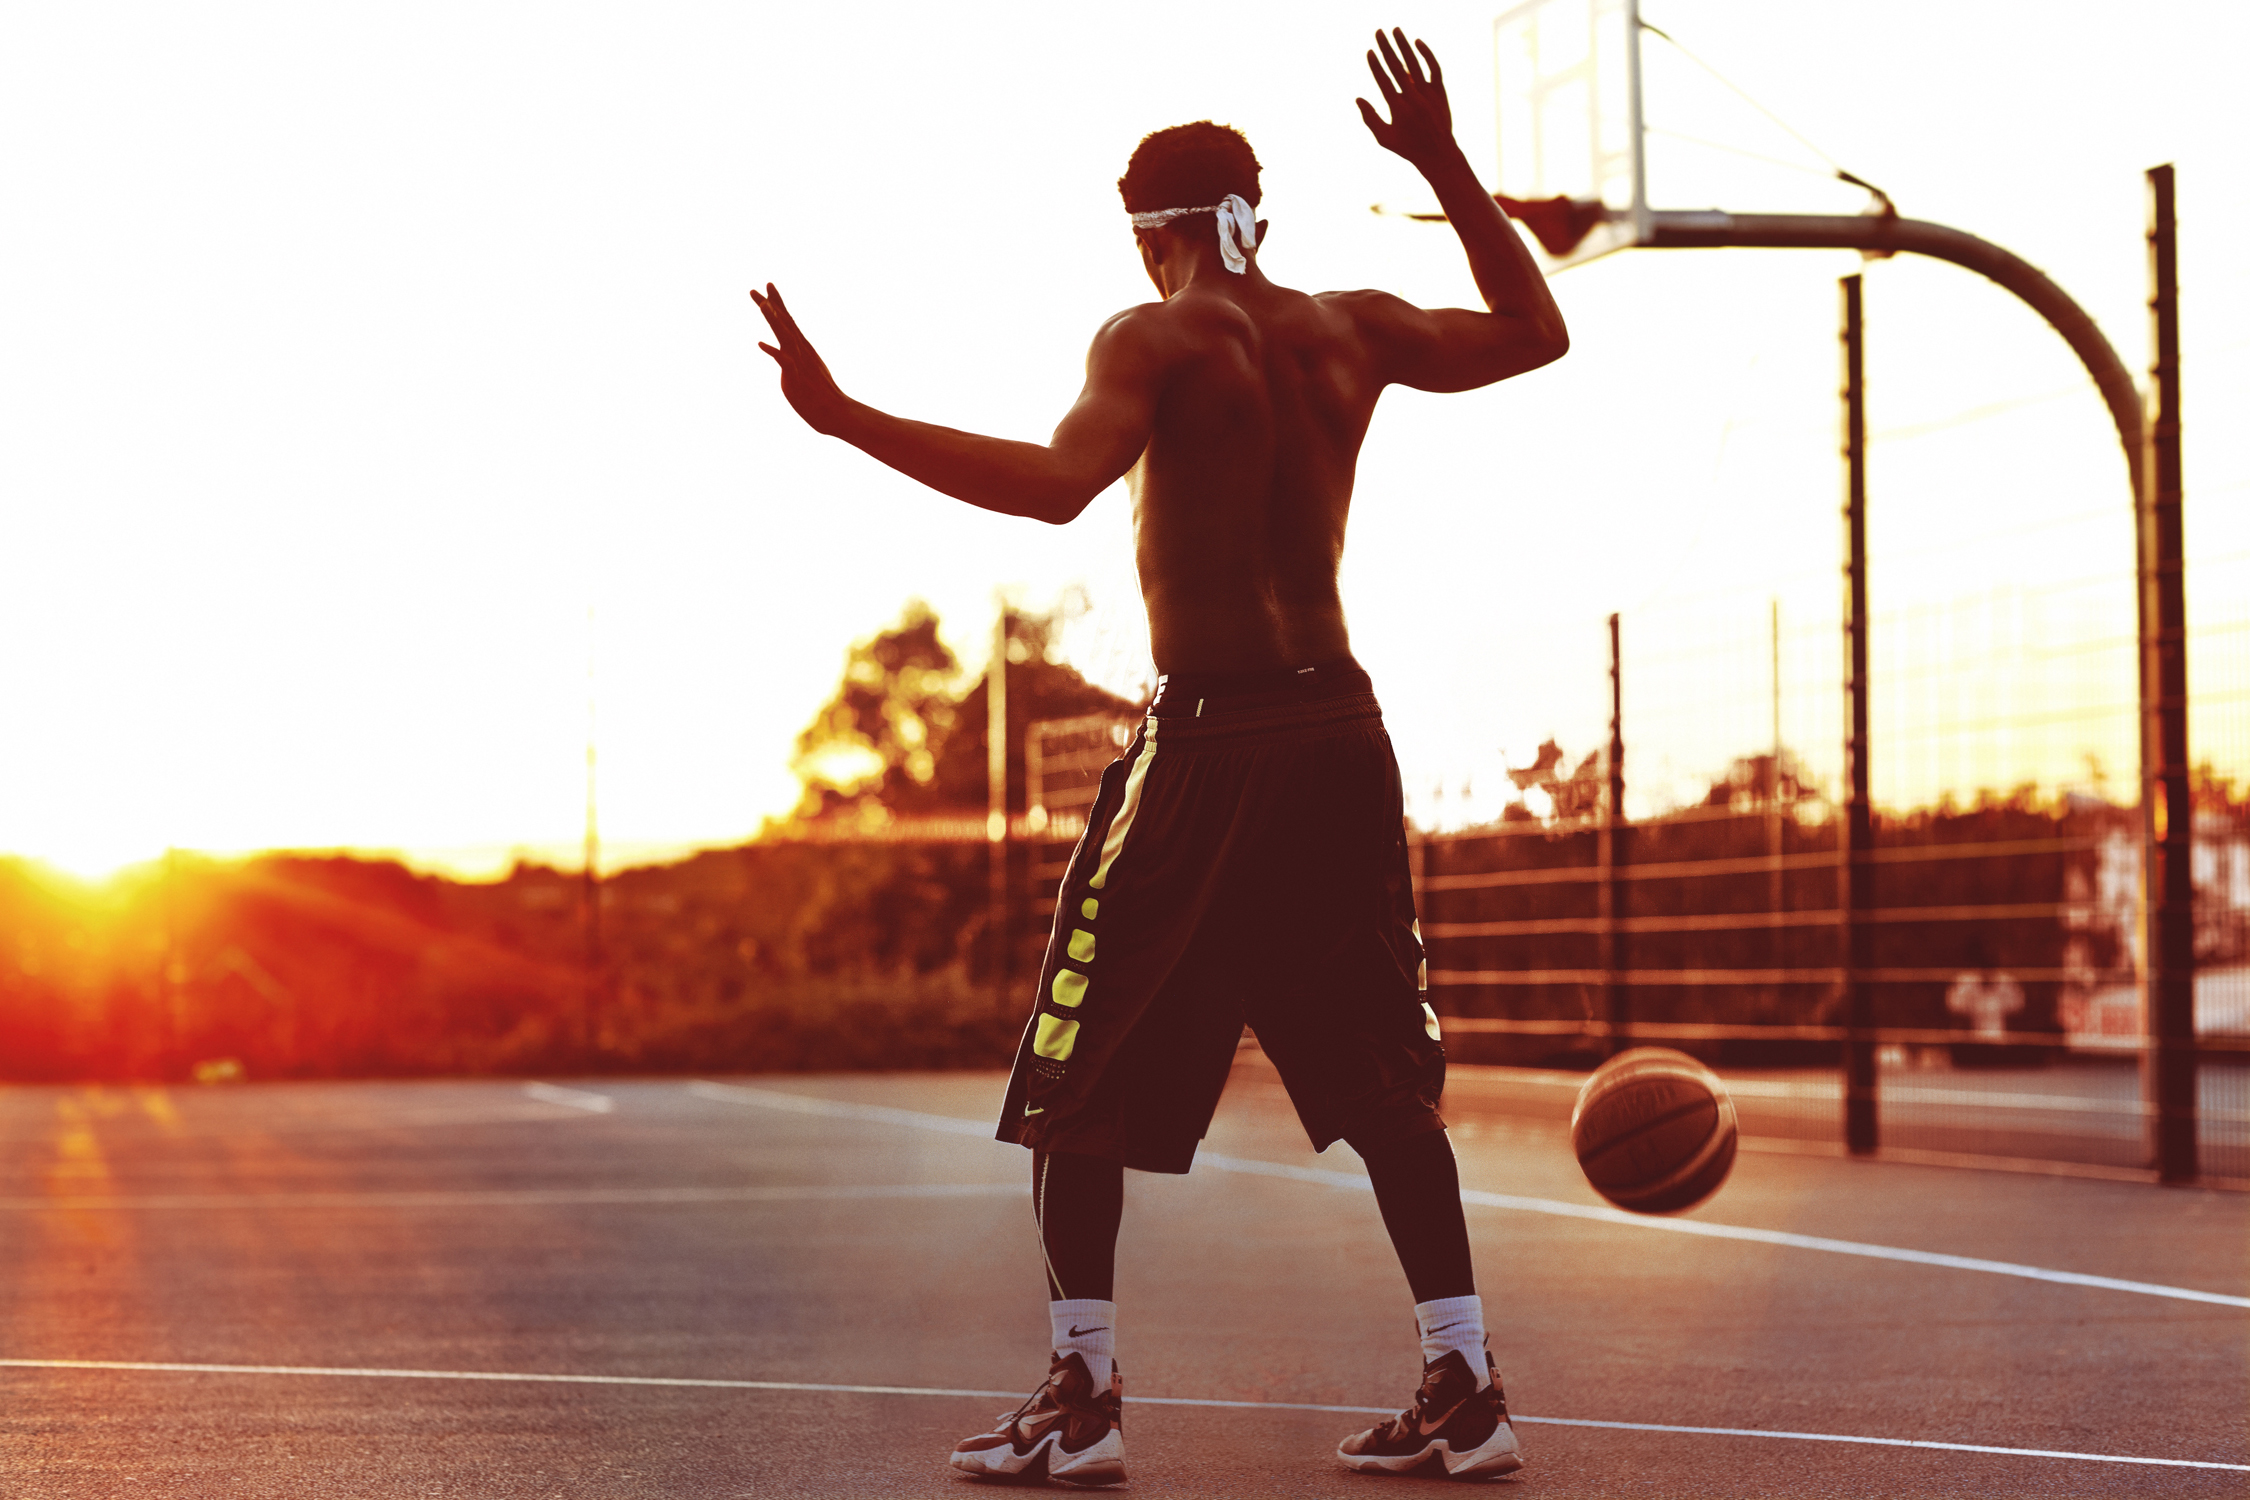 Parks Atheletics Basketball5